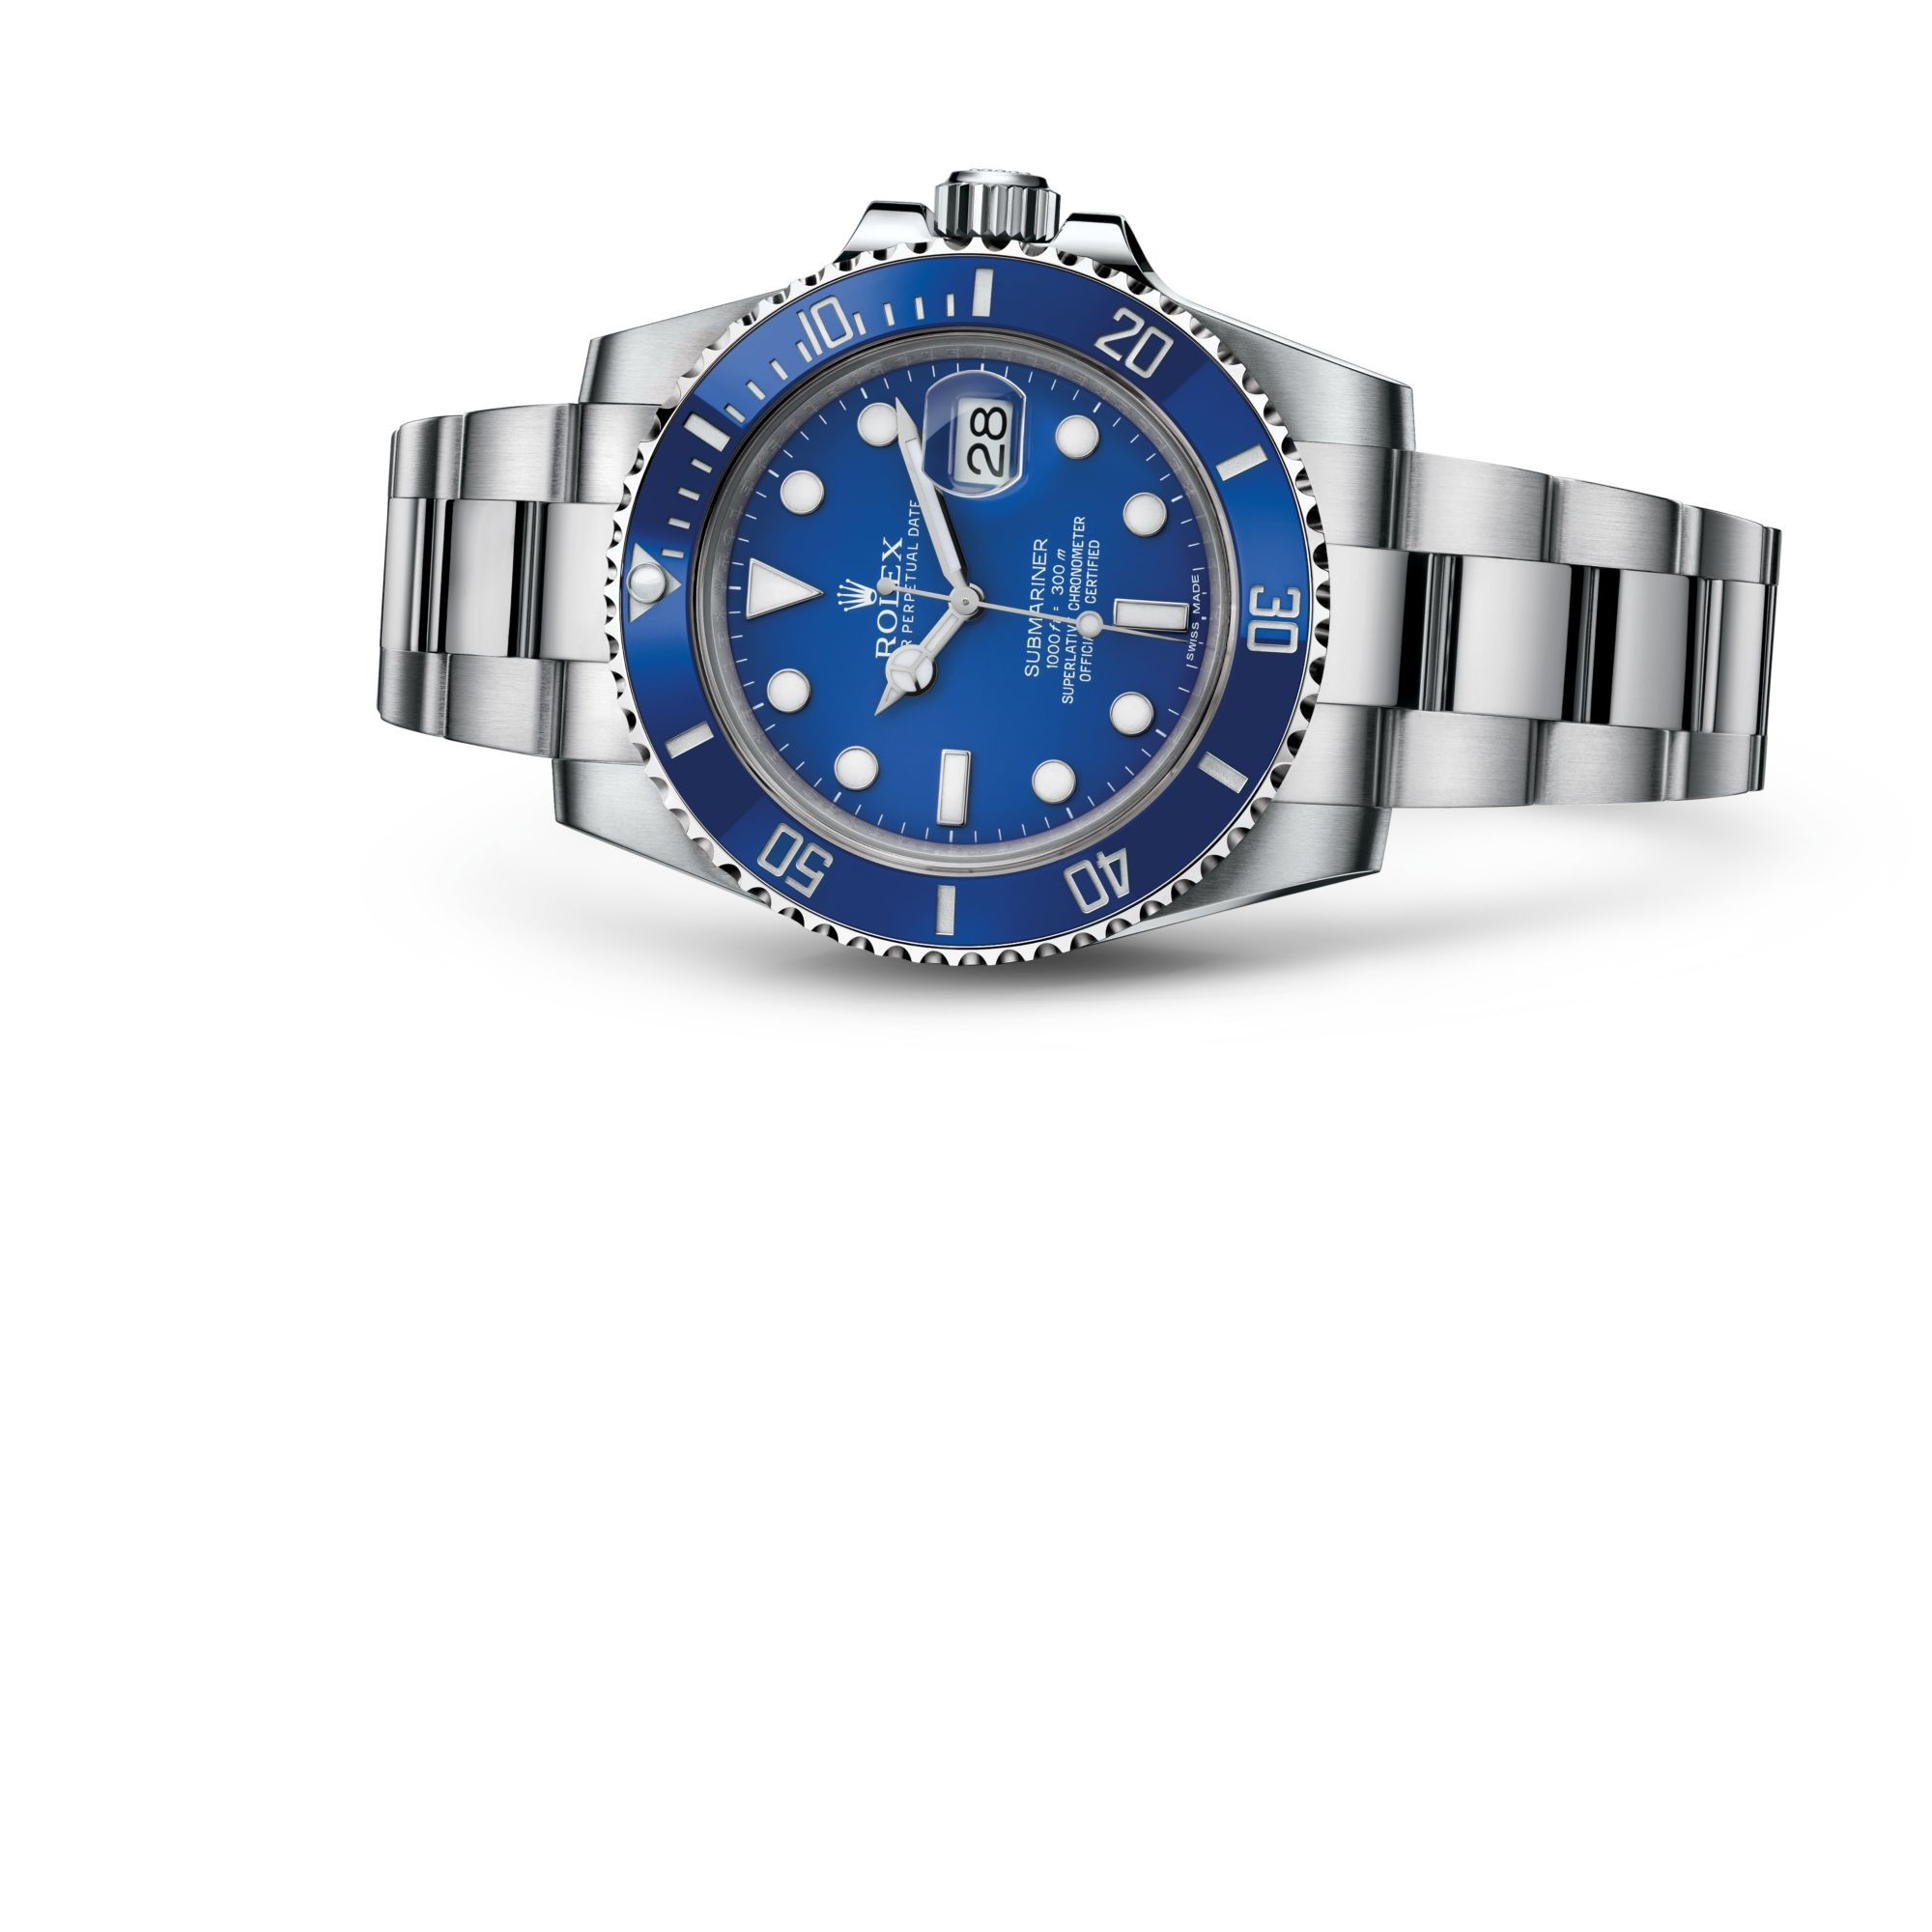 "Rolex <span lang=""en"">Submariner Date</span> M116619LB-0001"